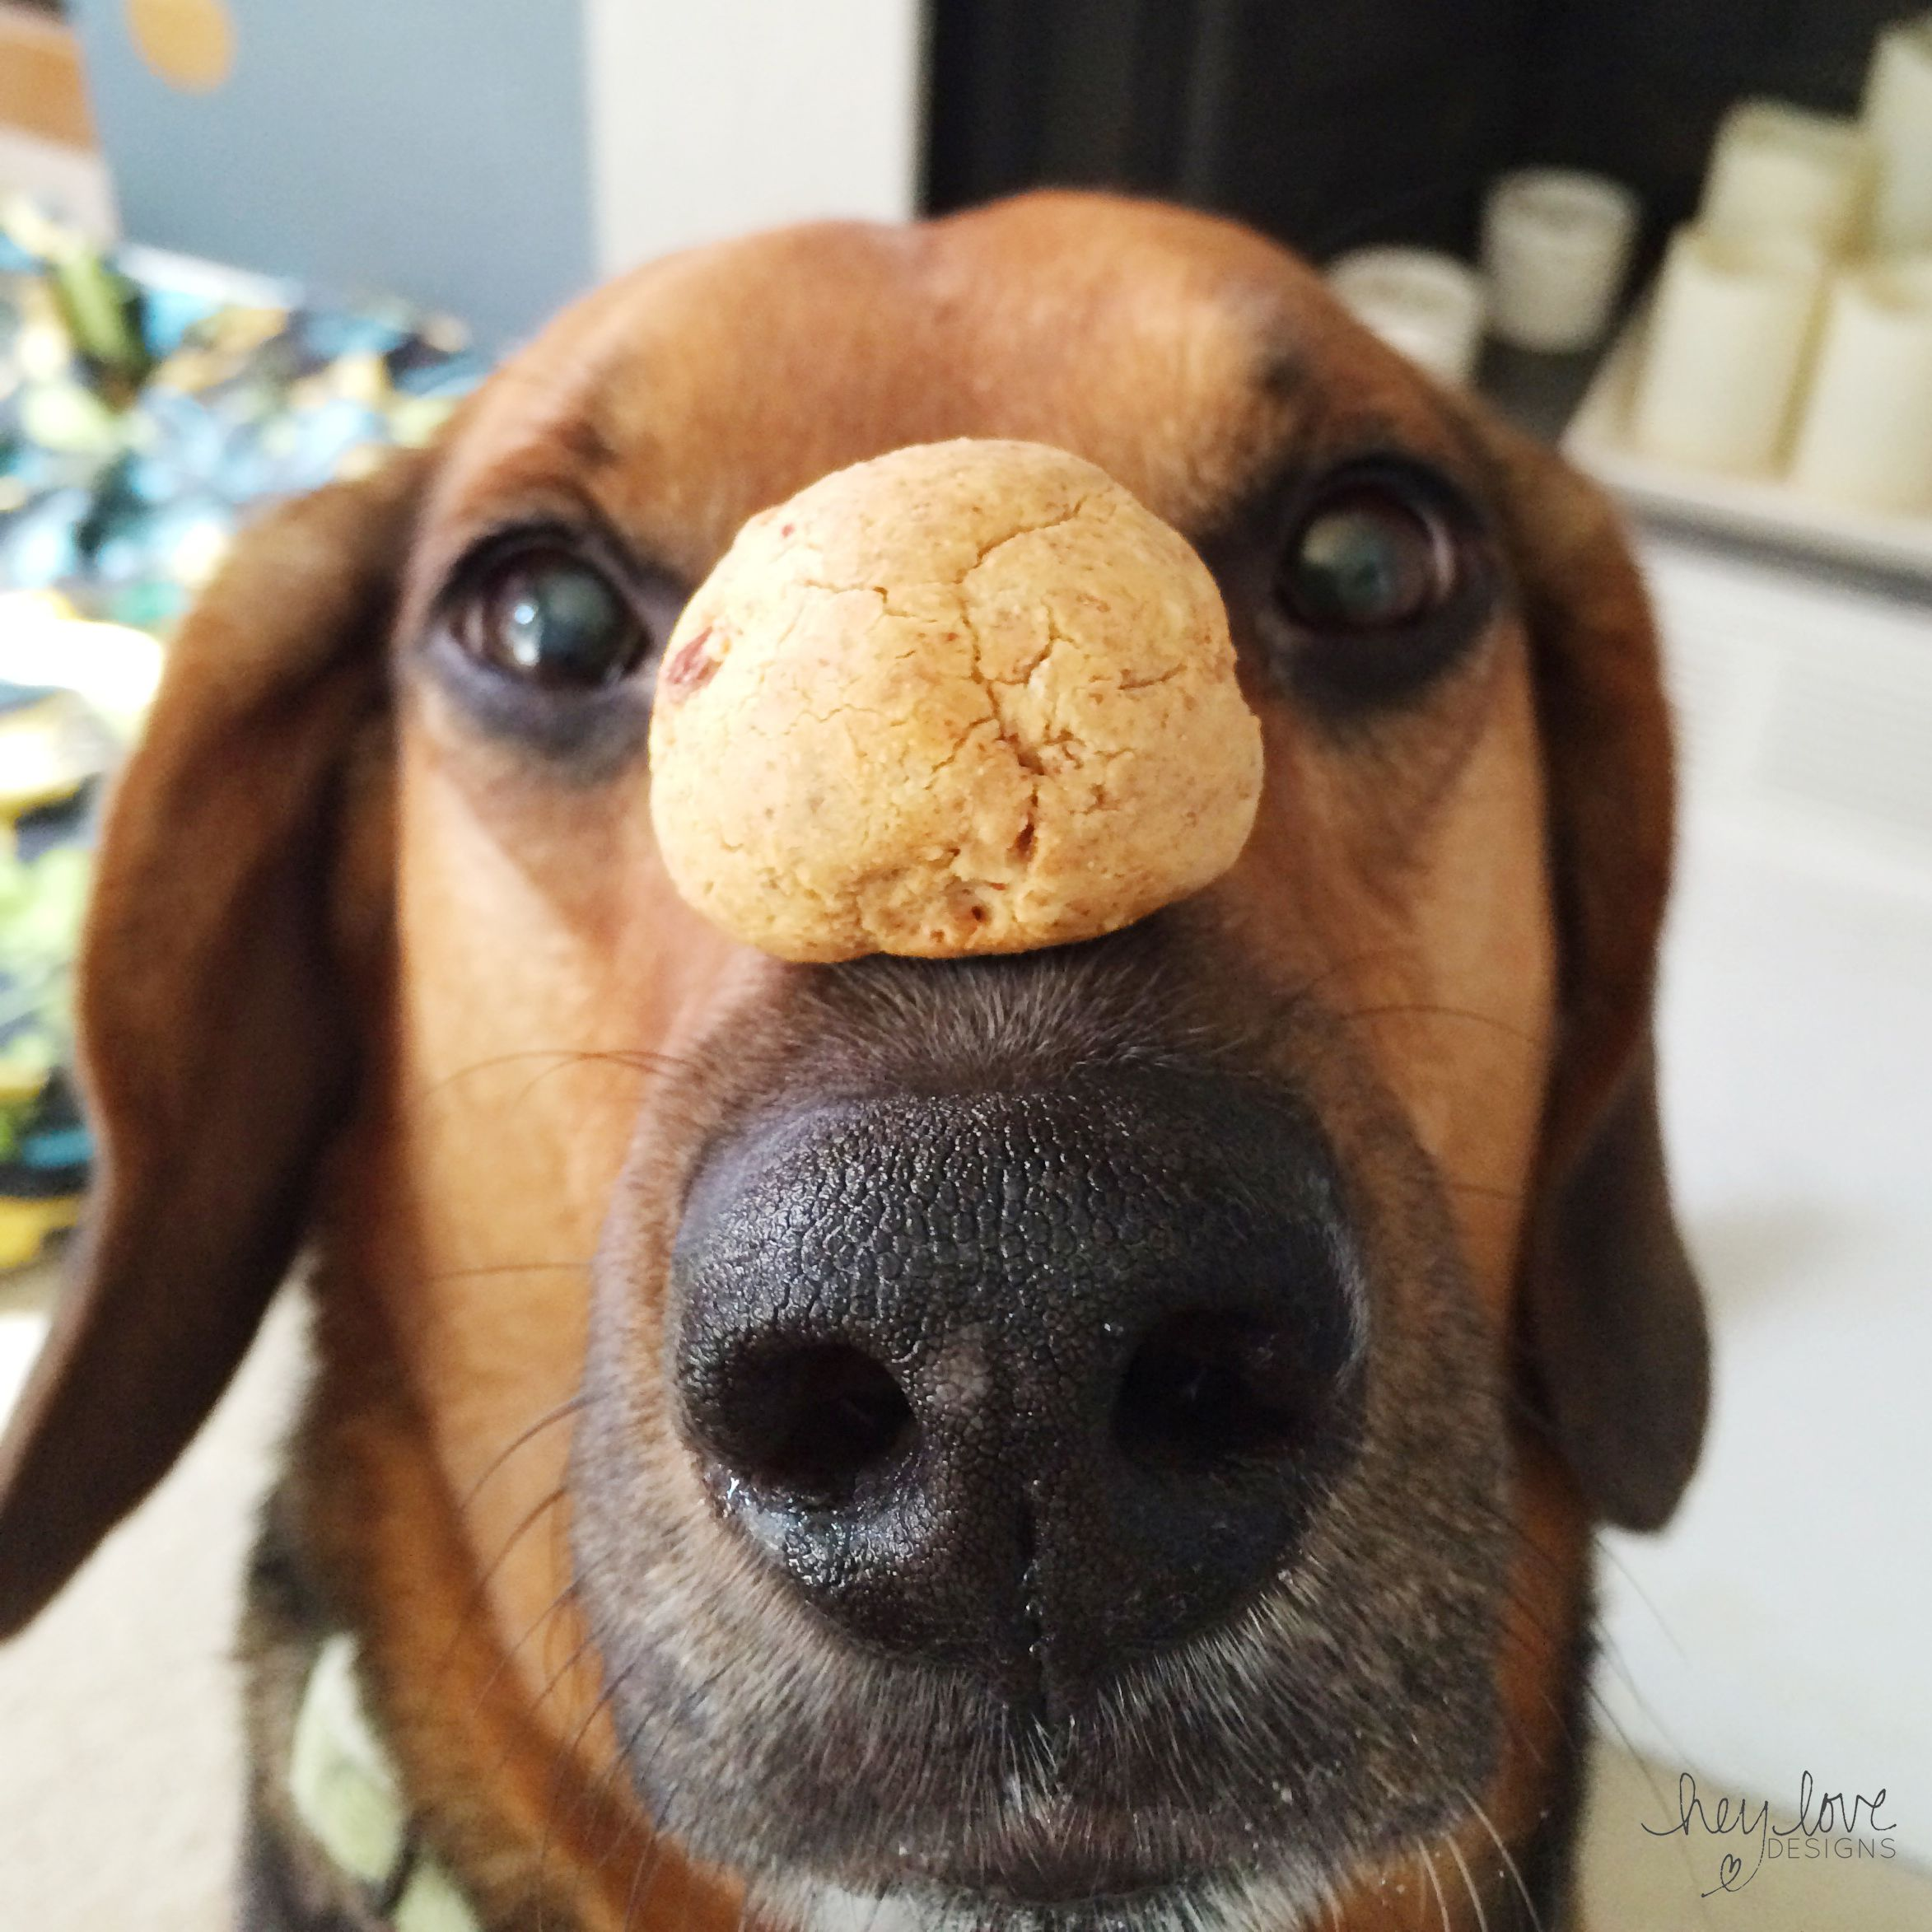 Dog Week: Grain Free Dog Treats | Hey Love Designs